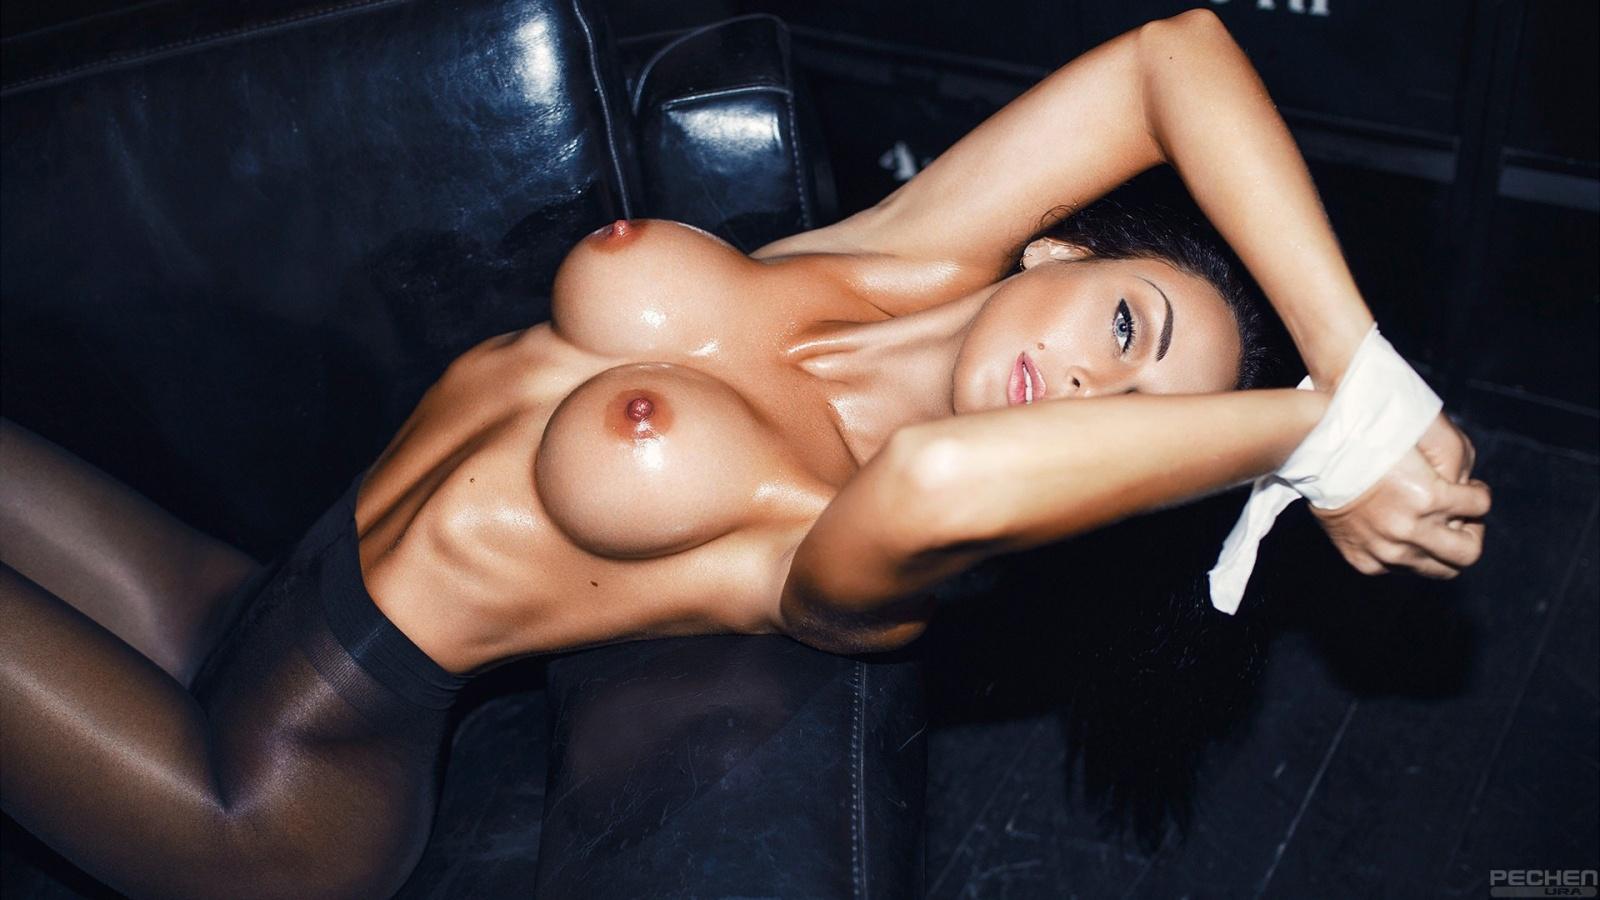 Stripper beautiful sexy ass ebony girls porn